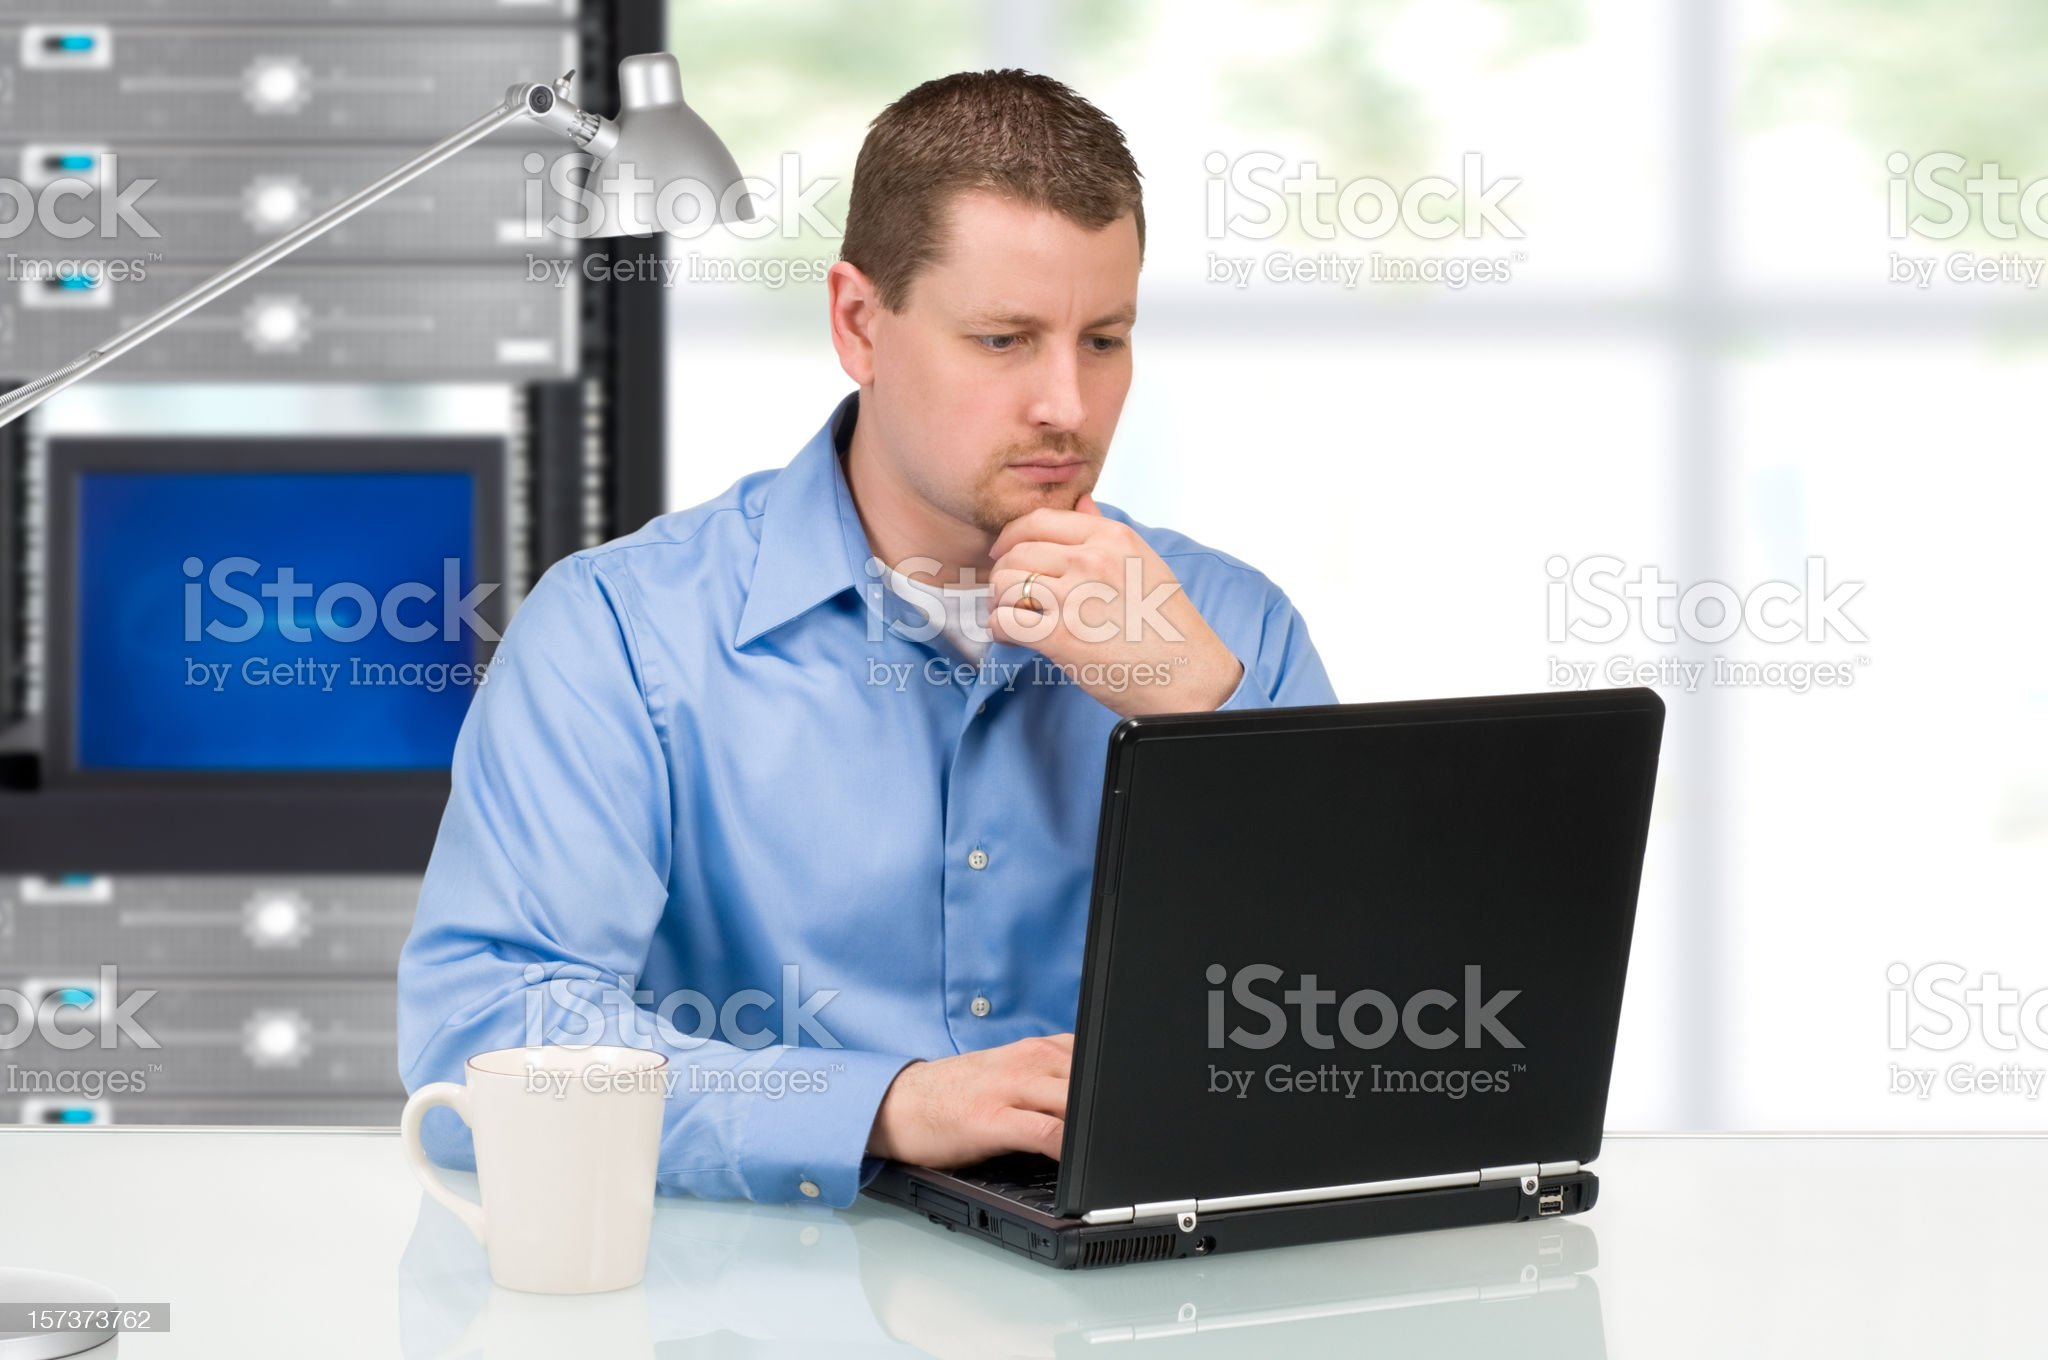 IT Professional royalty-free stock photo